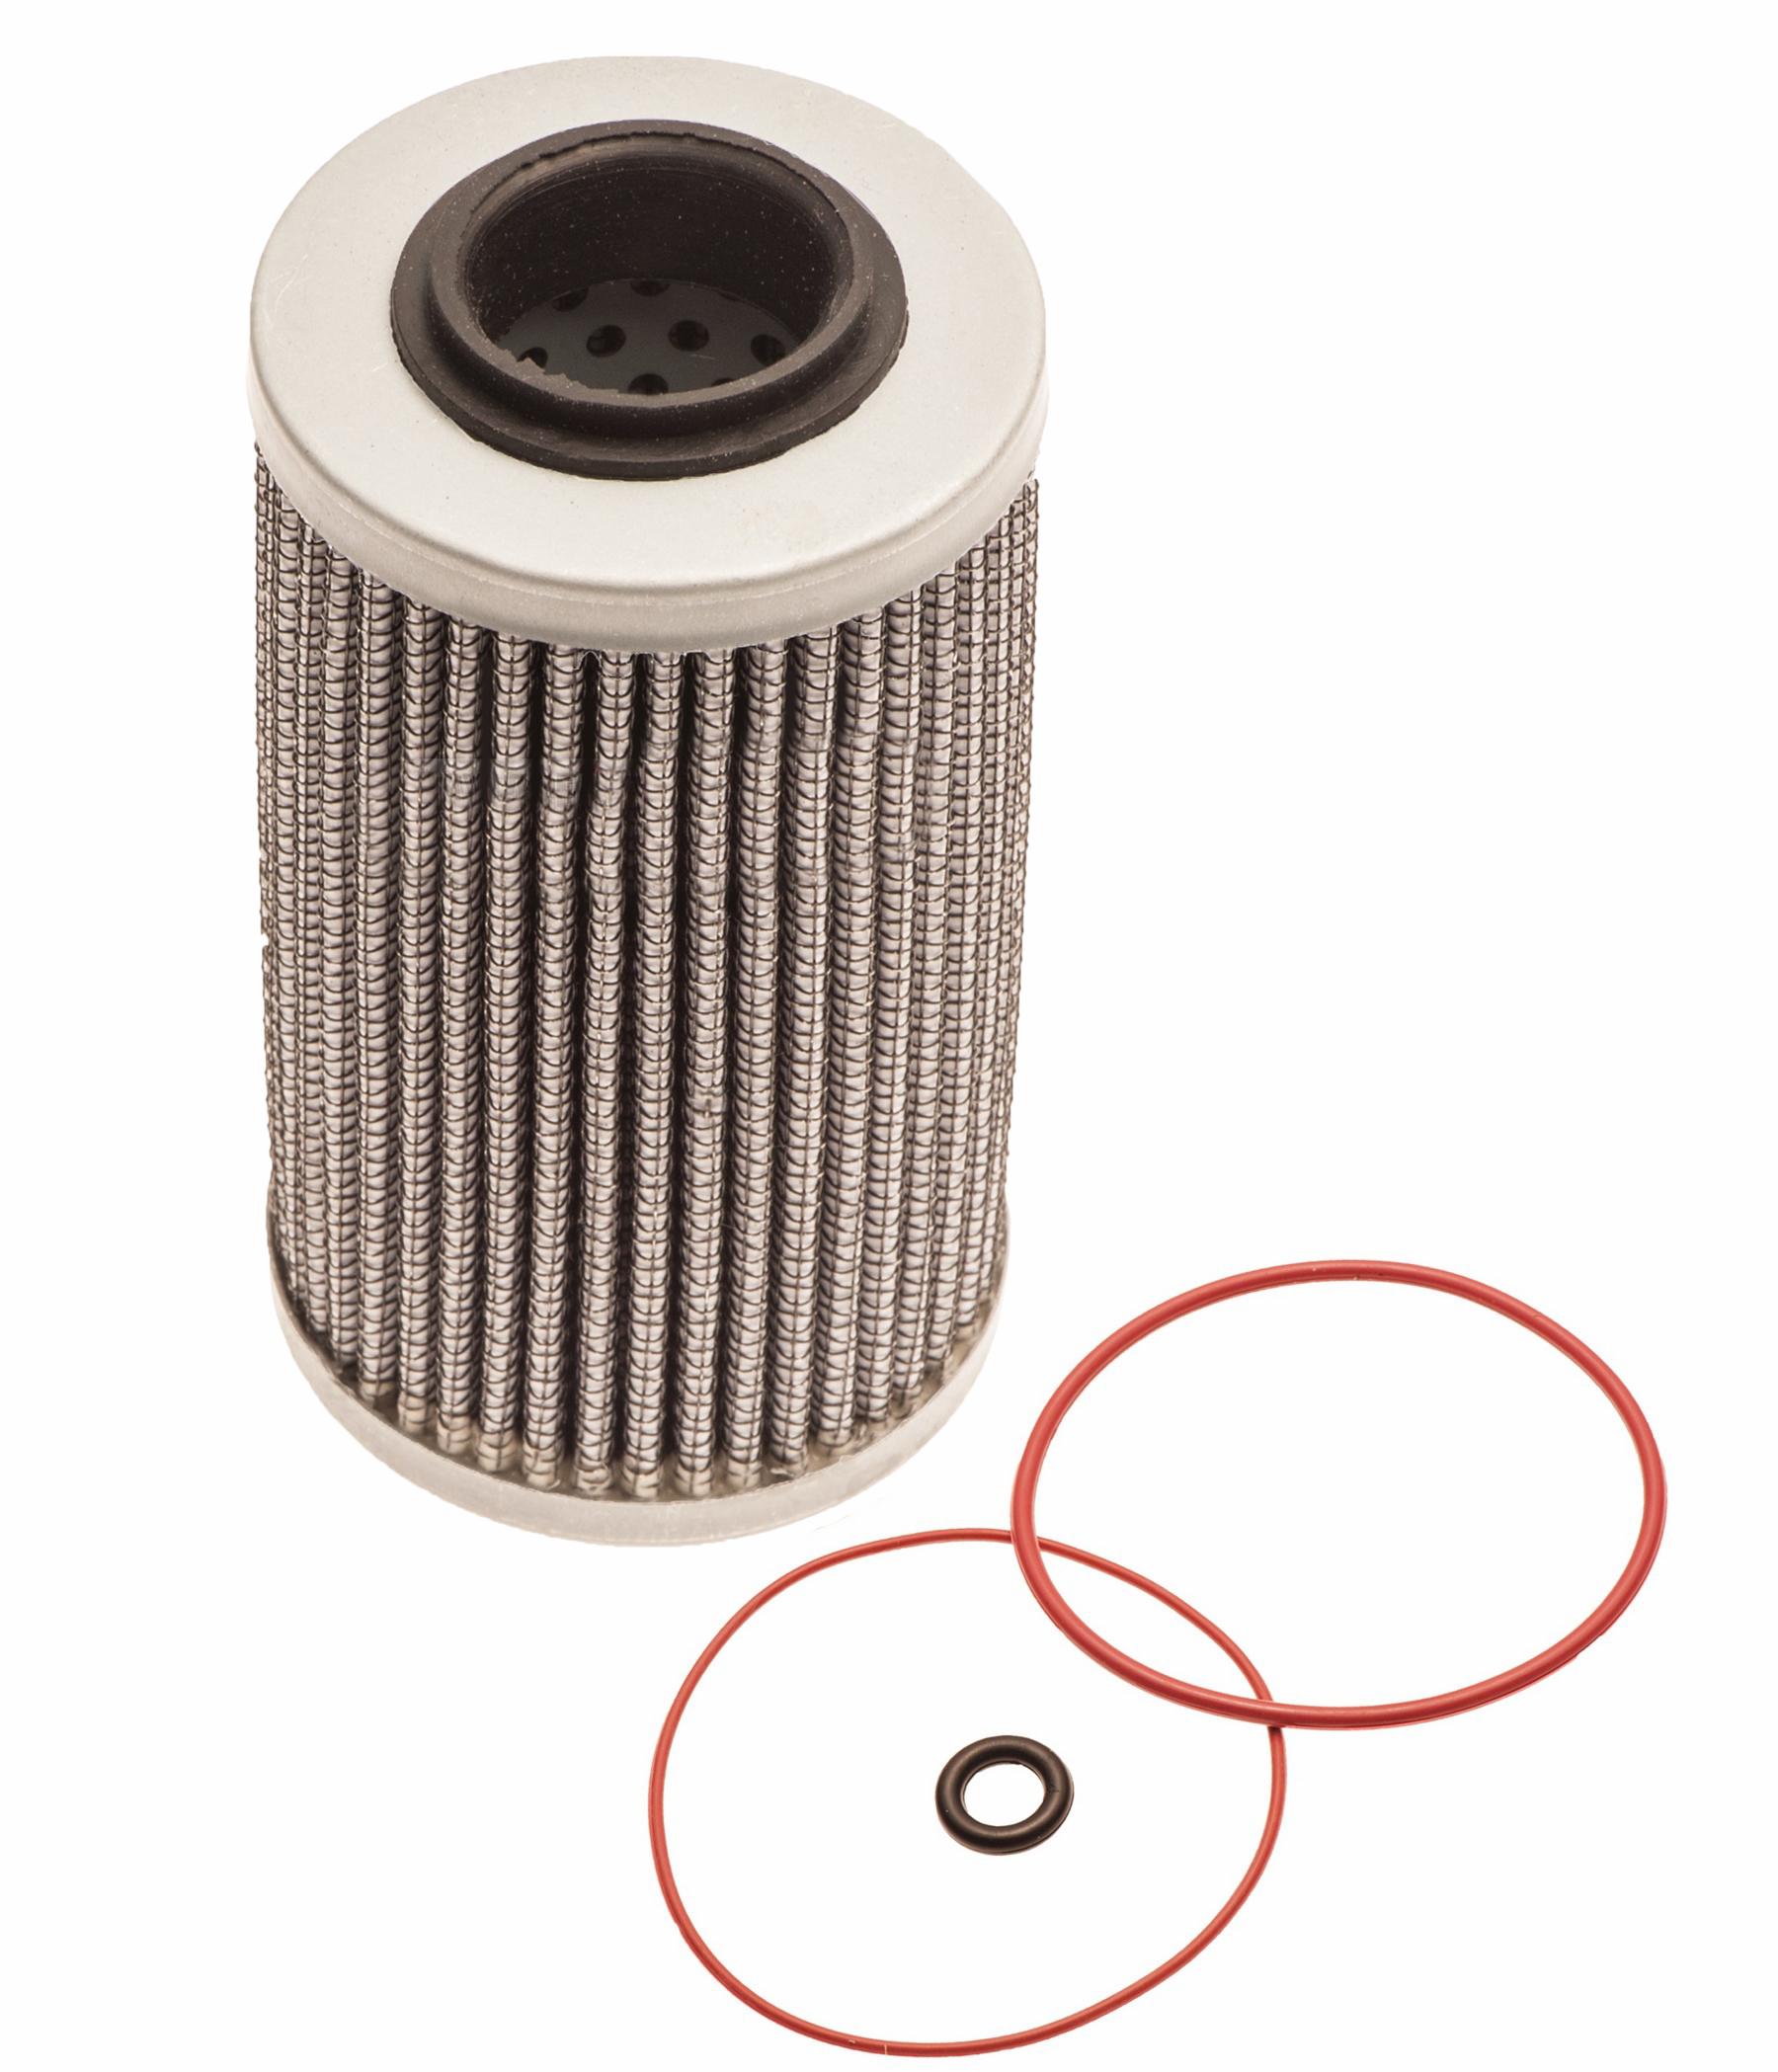 Seadoo Aftermarket O Ring Kit GTX 4-TEC RXT WAKE 420230920 420950860 420850500